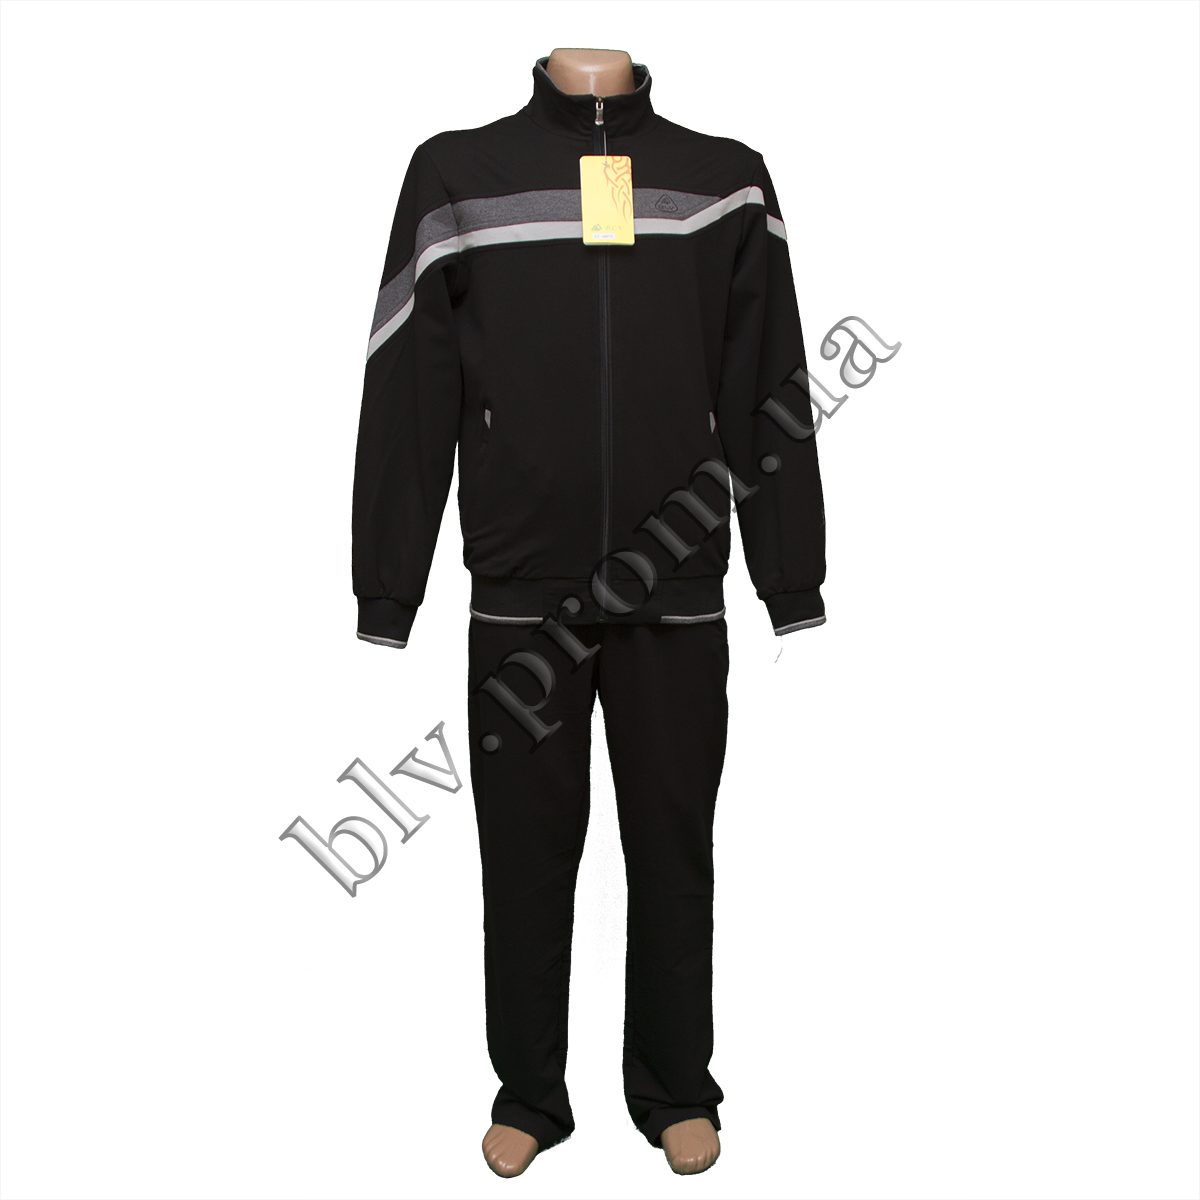 Трикотажный мужской спортивный костюм тм. Boulevard  FZ1607N